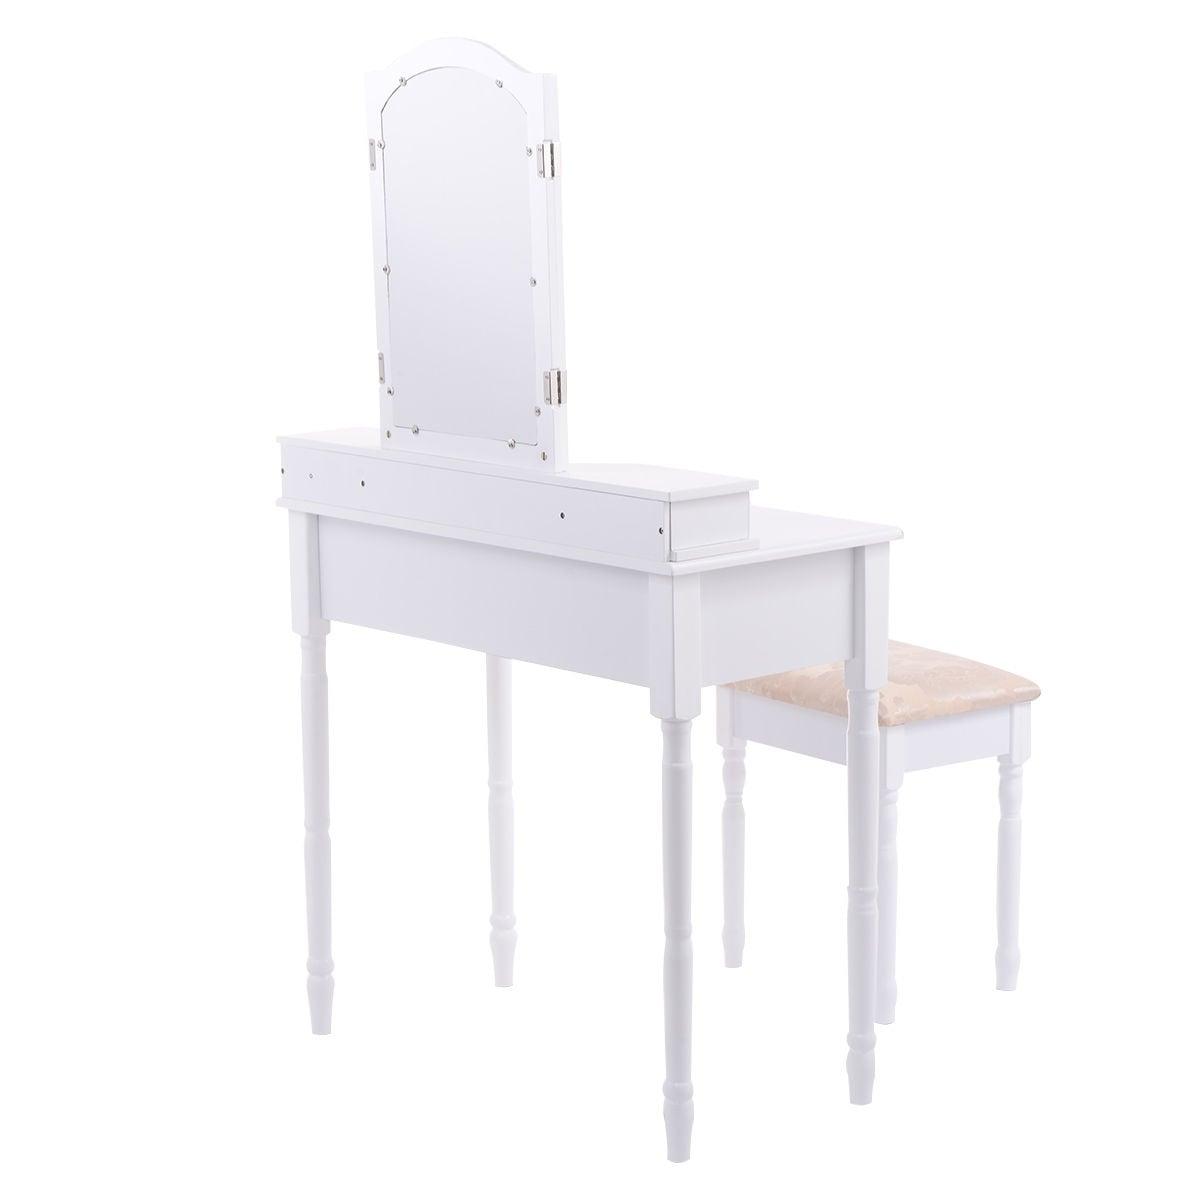 Shop Costway White Tri Folding Mirror Vanity Makeup Table Stool Set ...